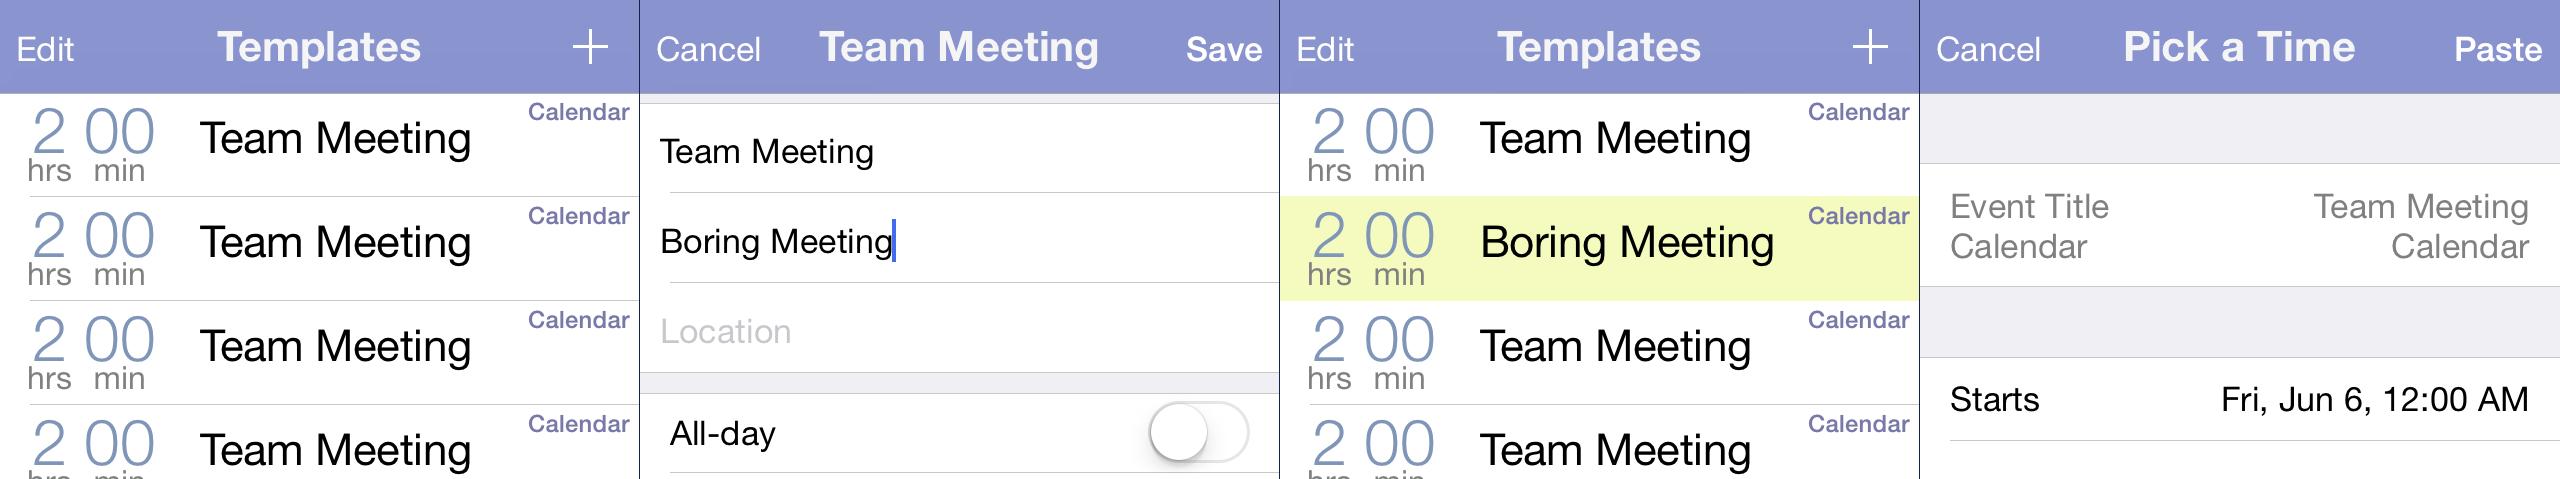 screenshots of the app